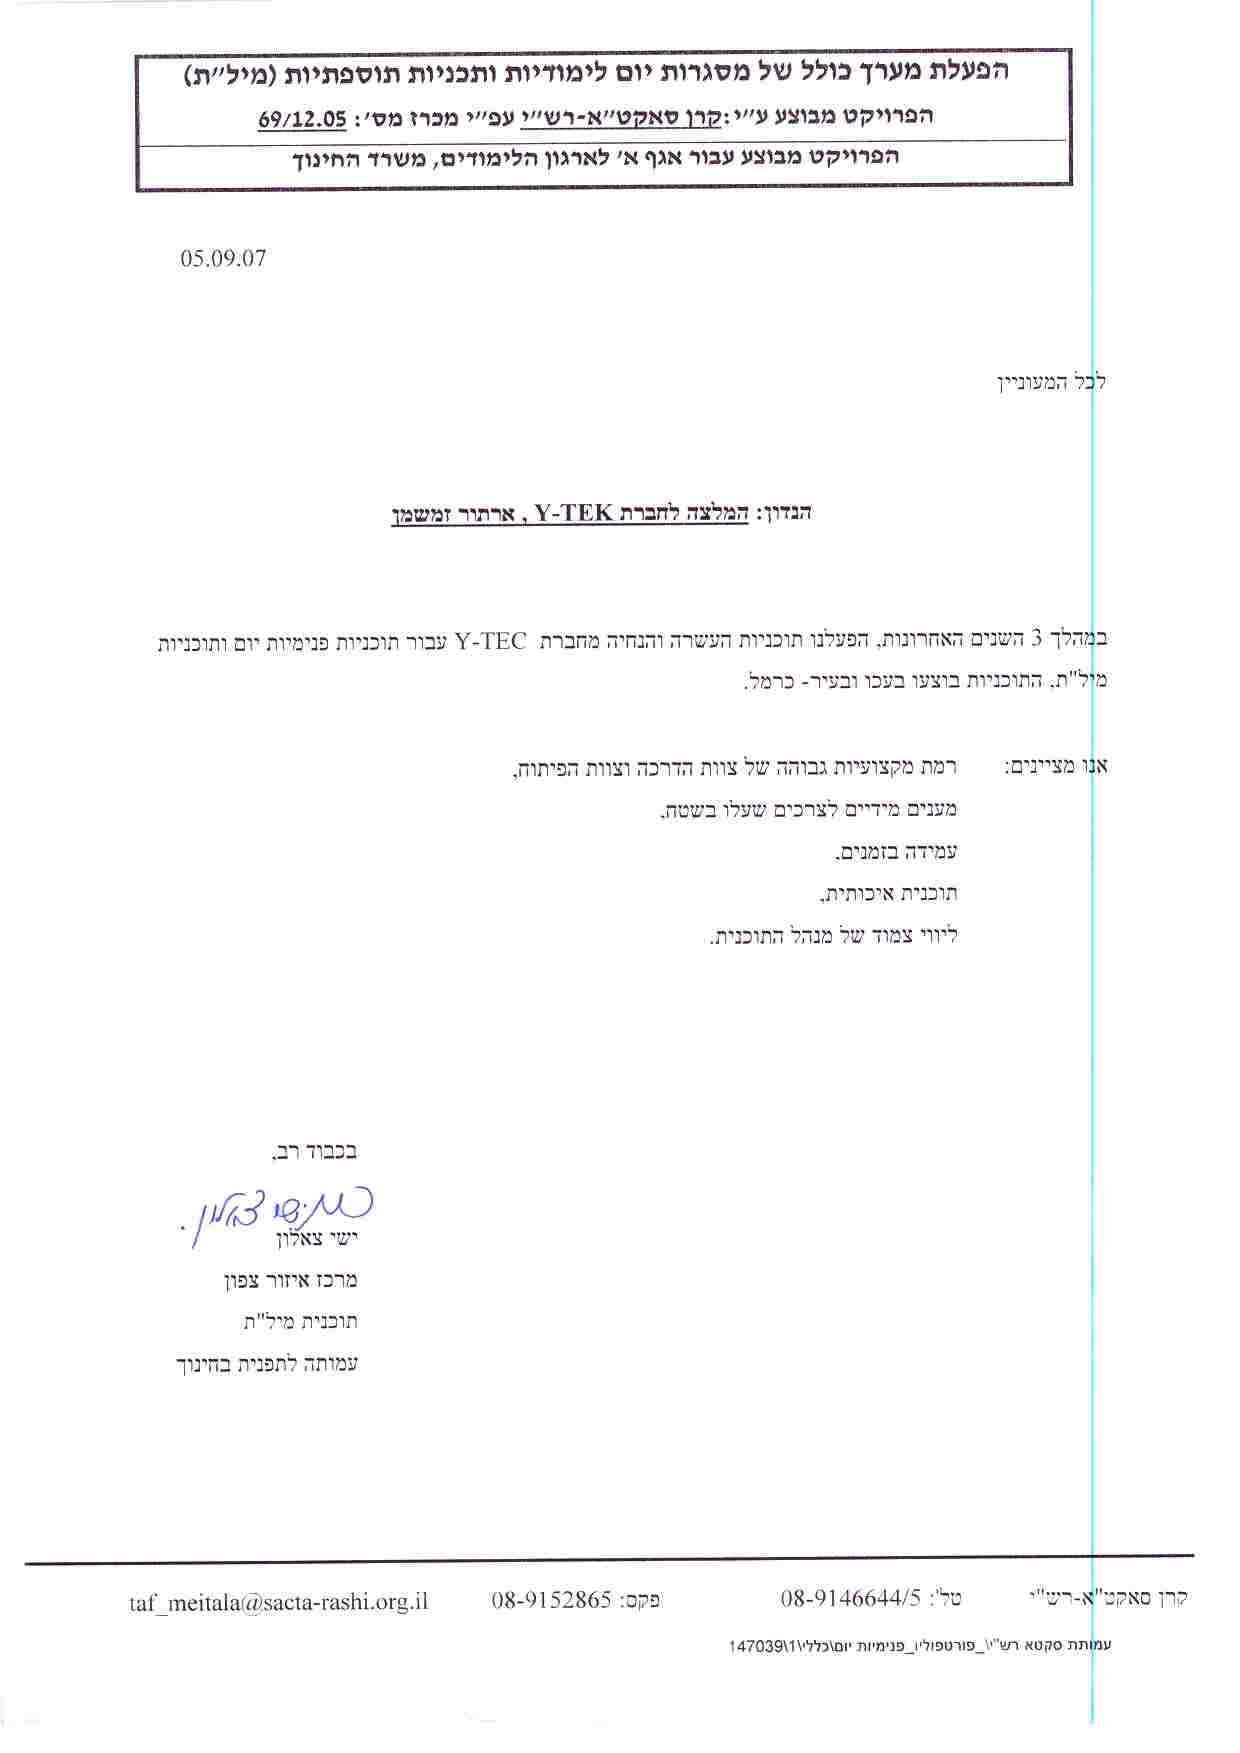 מכתב הערכה 2007